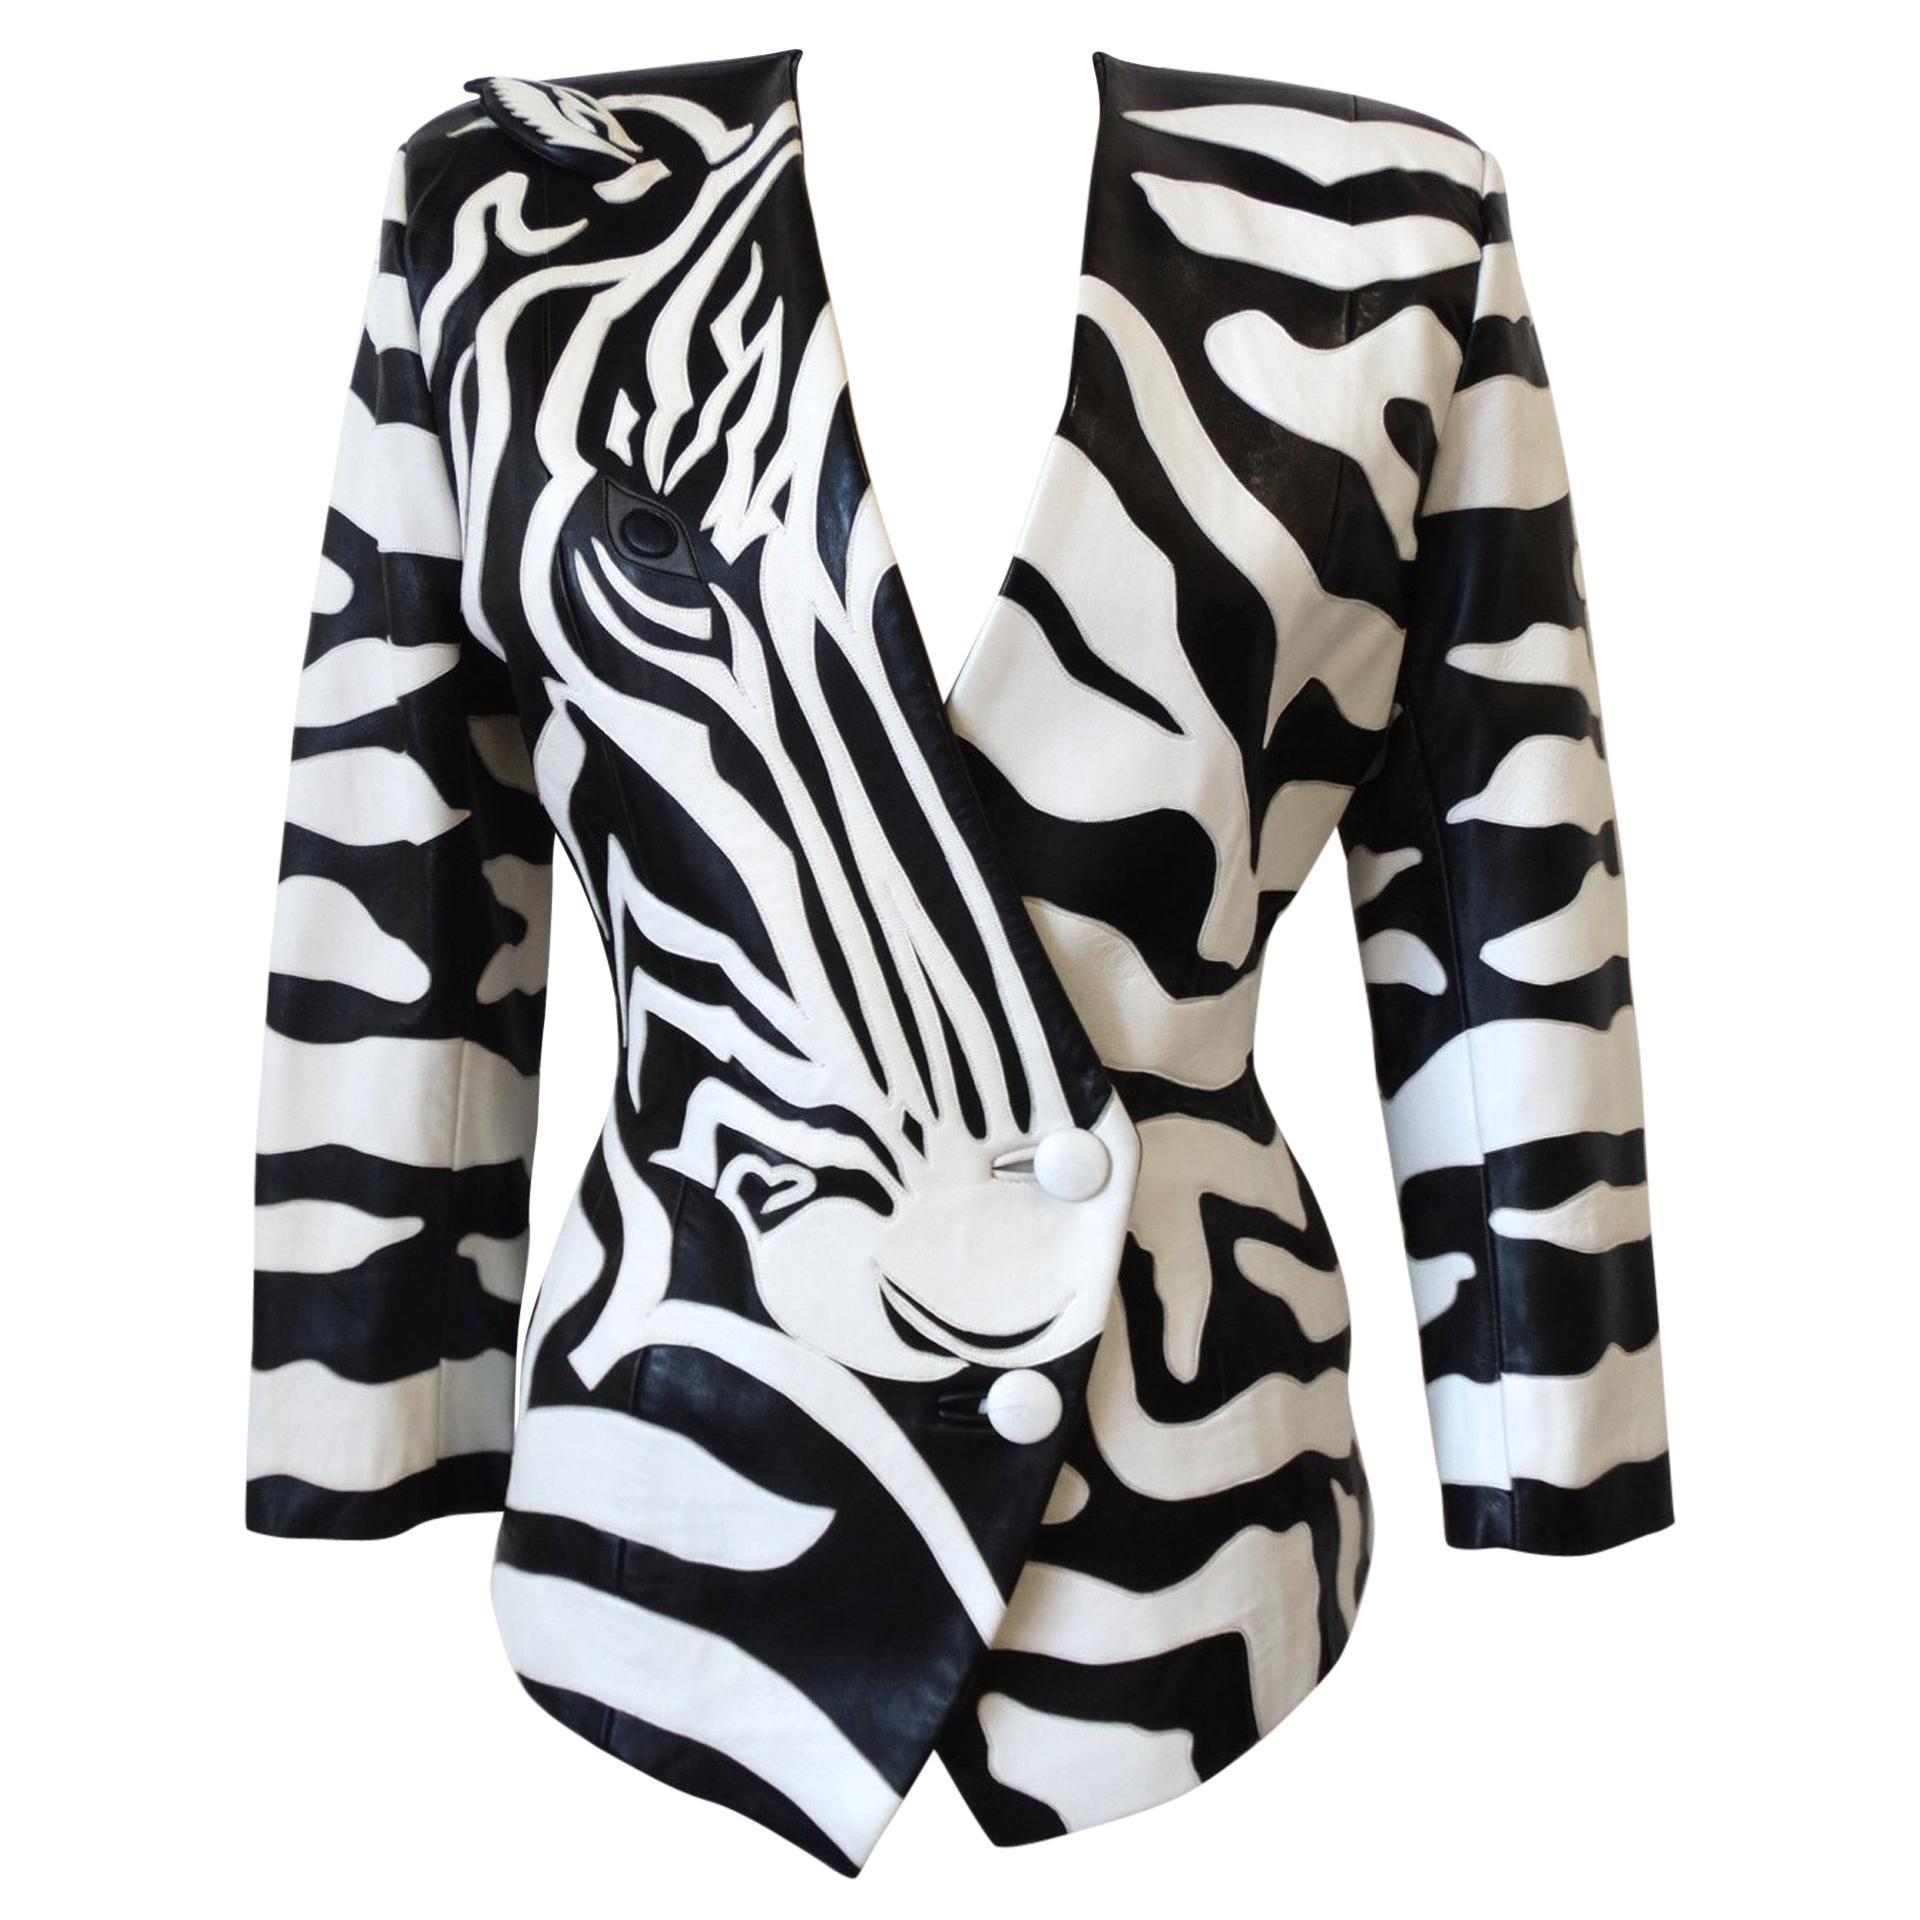 1980s Jean Claude Jitrois Zebra Leather Jacket